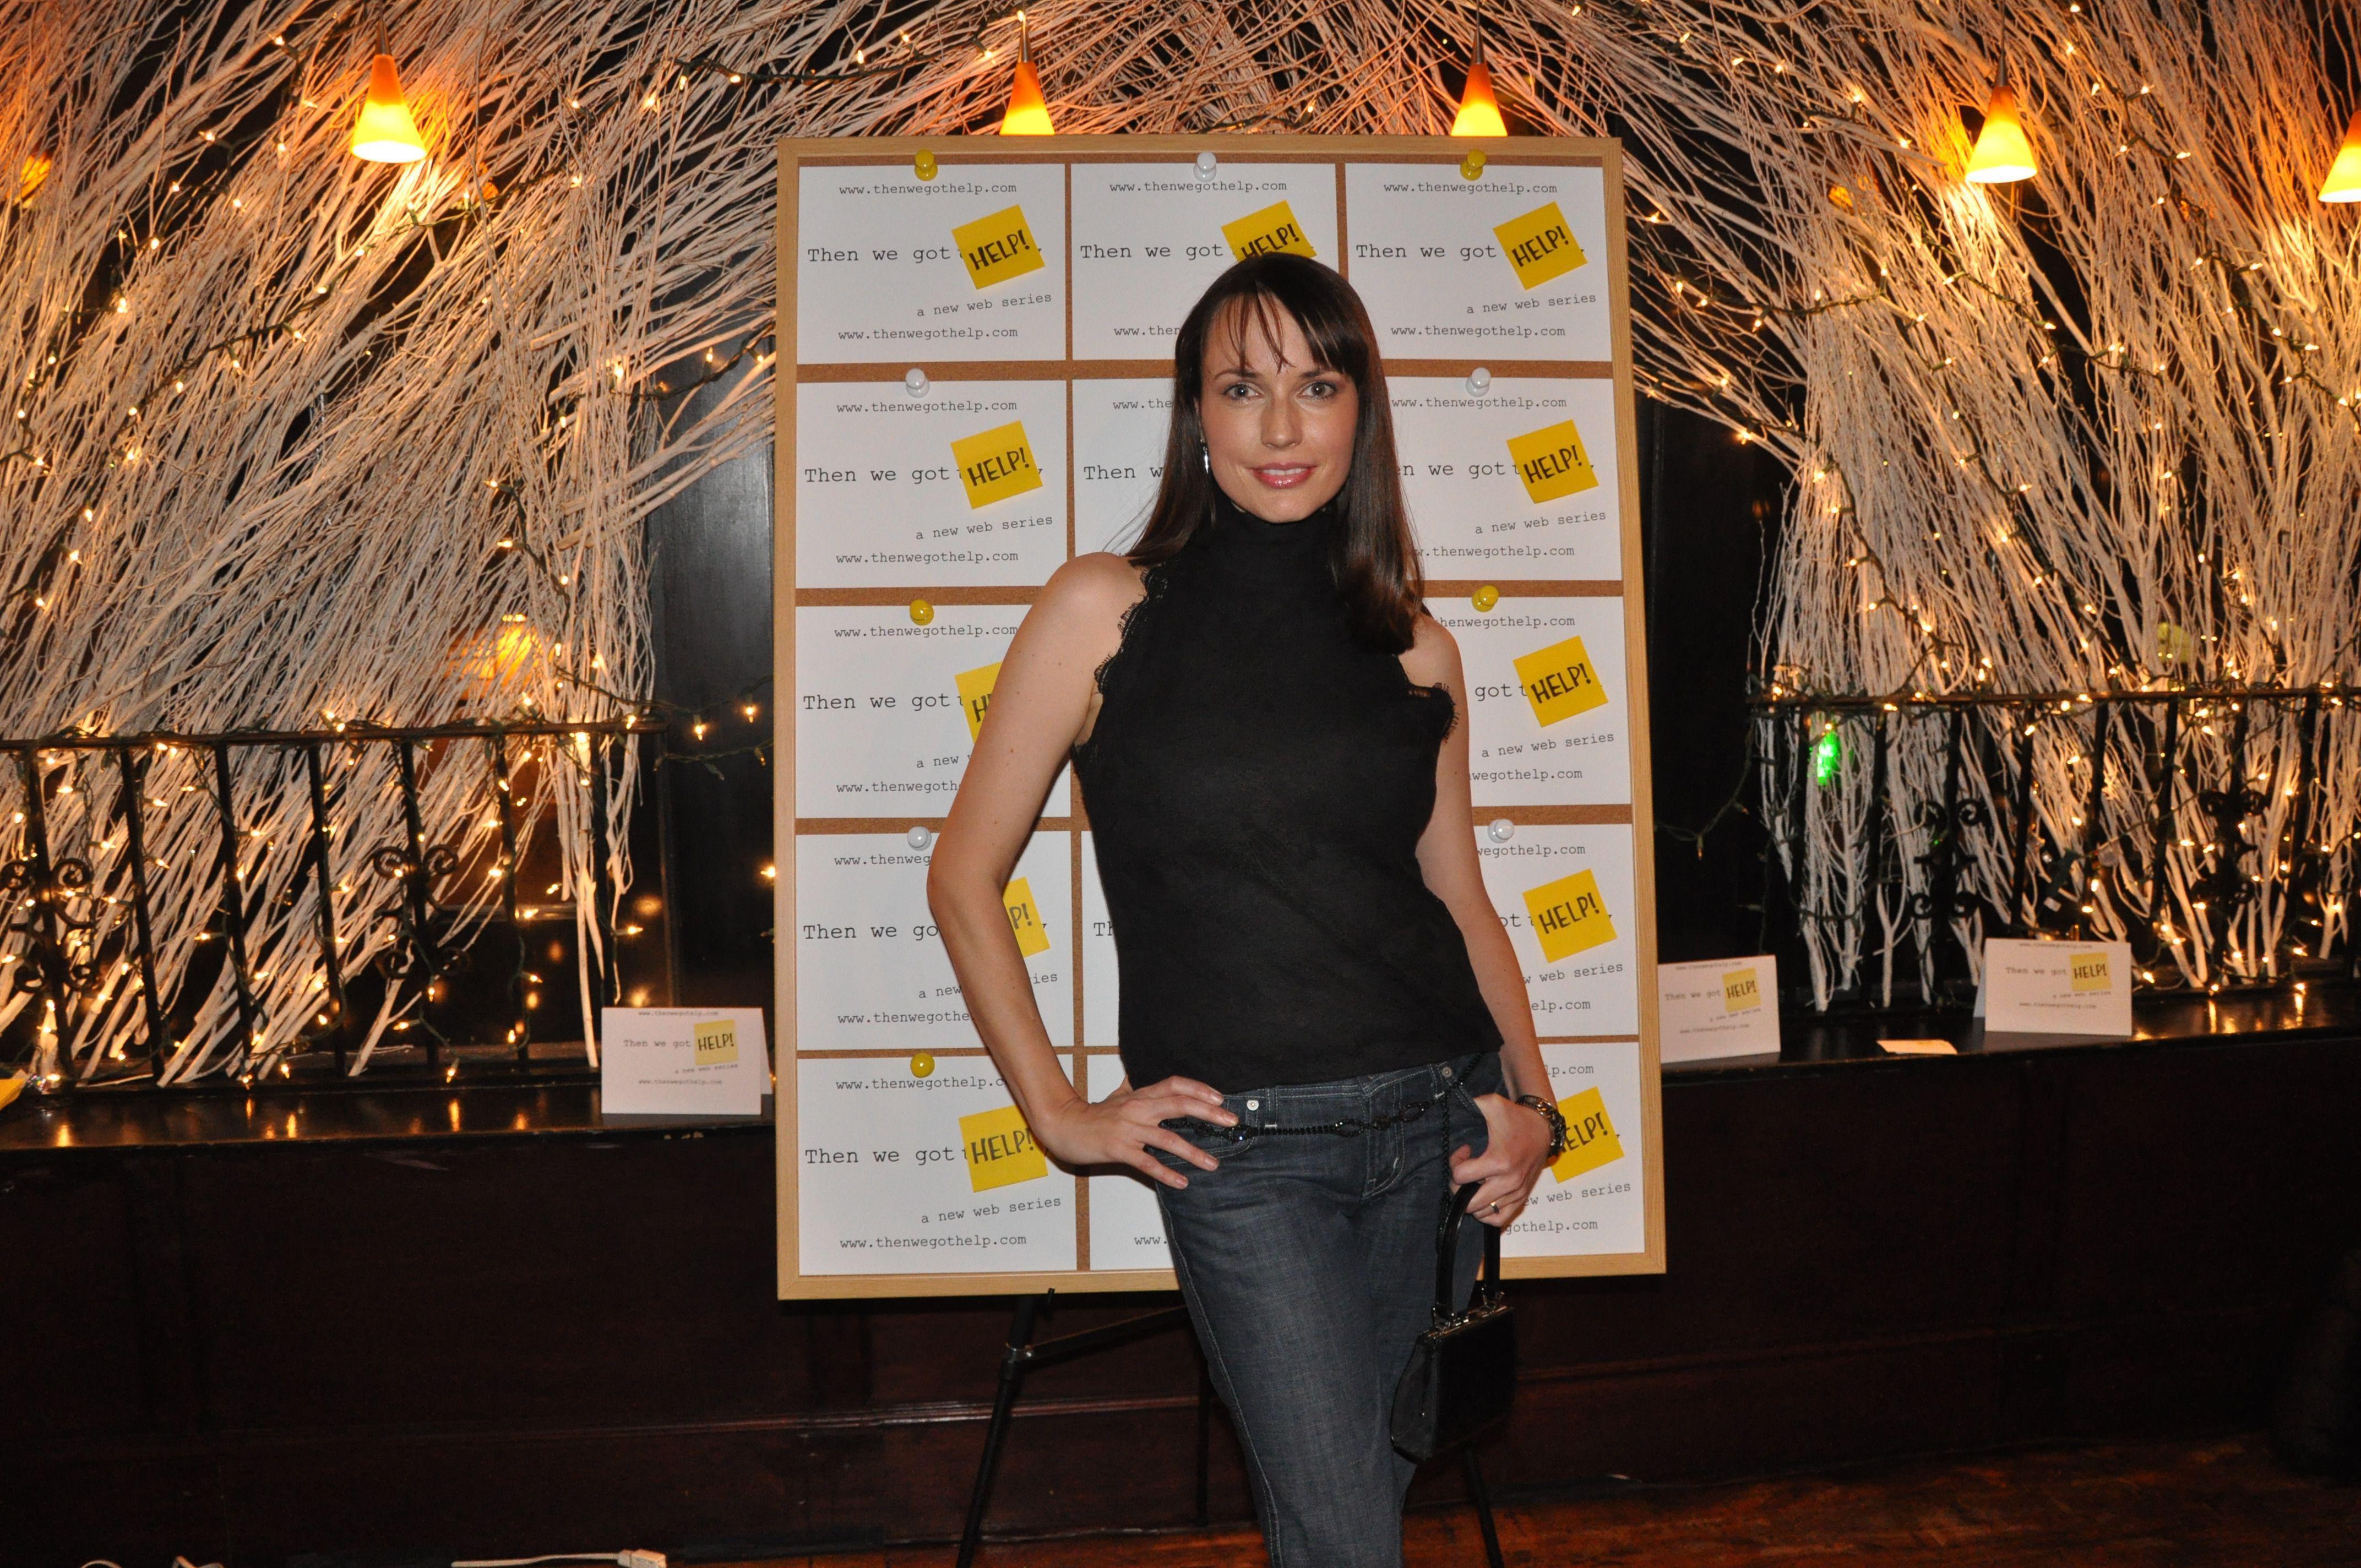 Julie Ann Emery Wallpapers Backgrounds 4288x2848